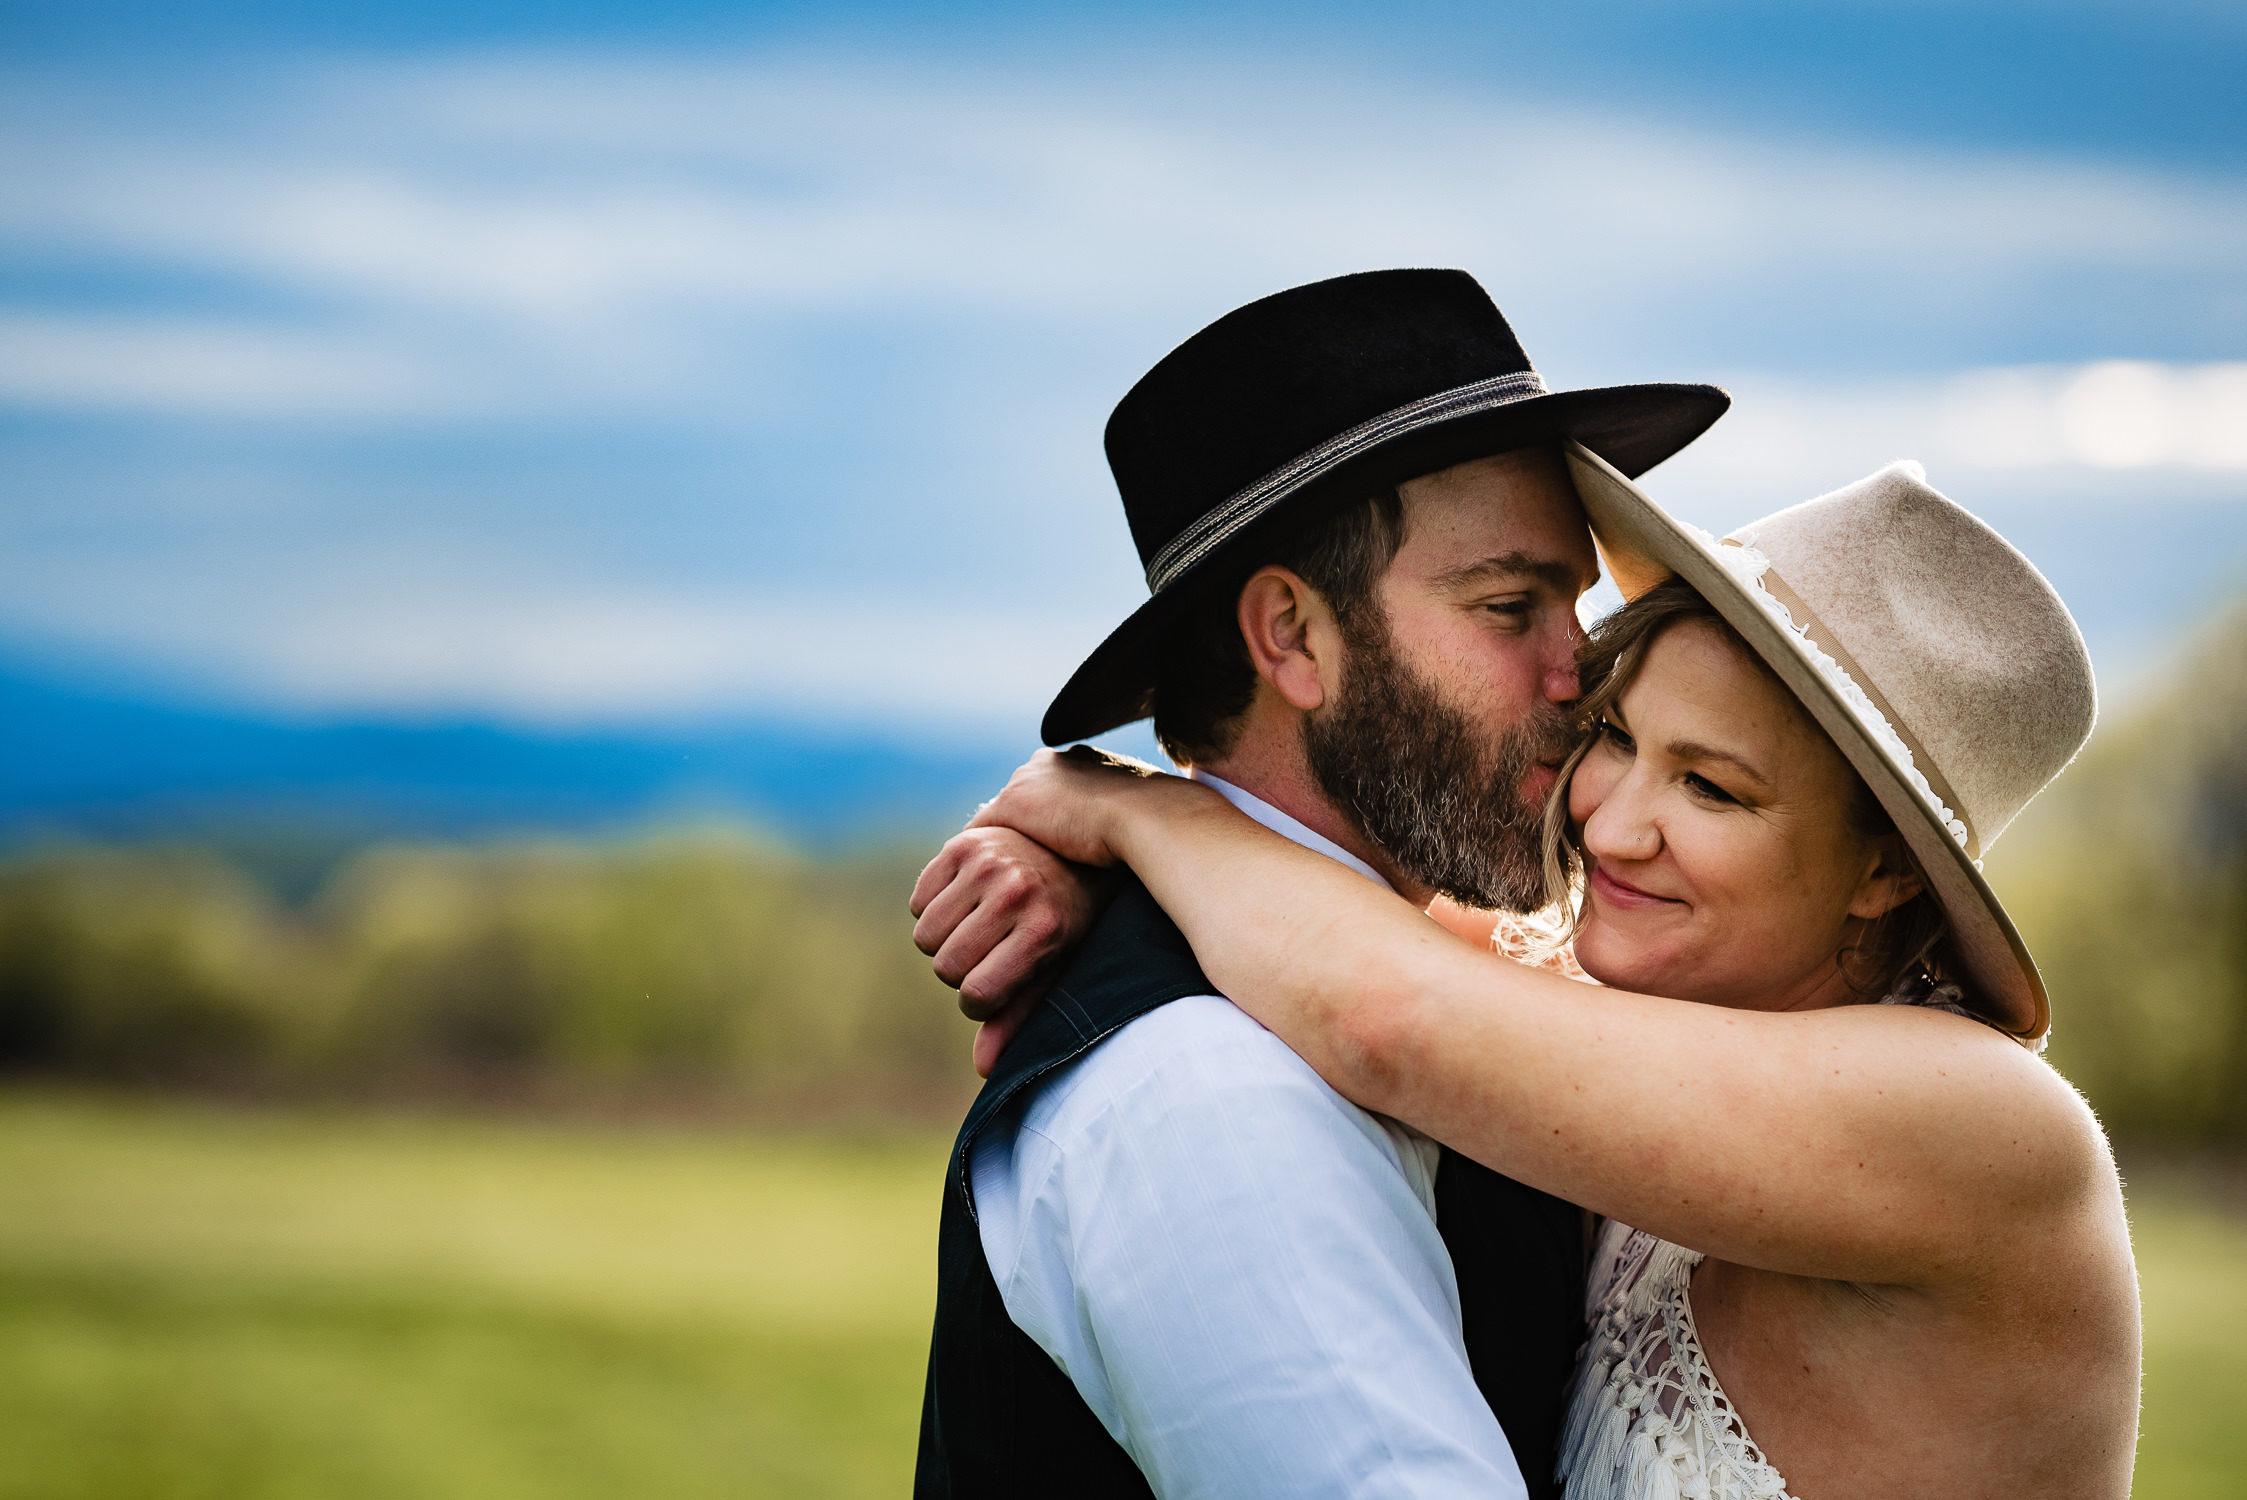 tourterelle-vermont-wedding-photographers-041-2-2247x1500.jpg